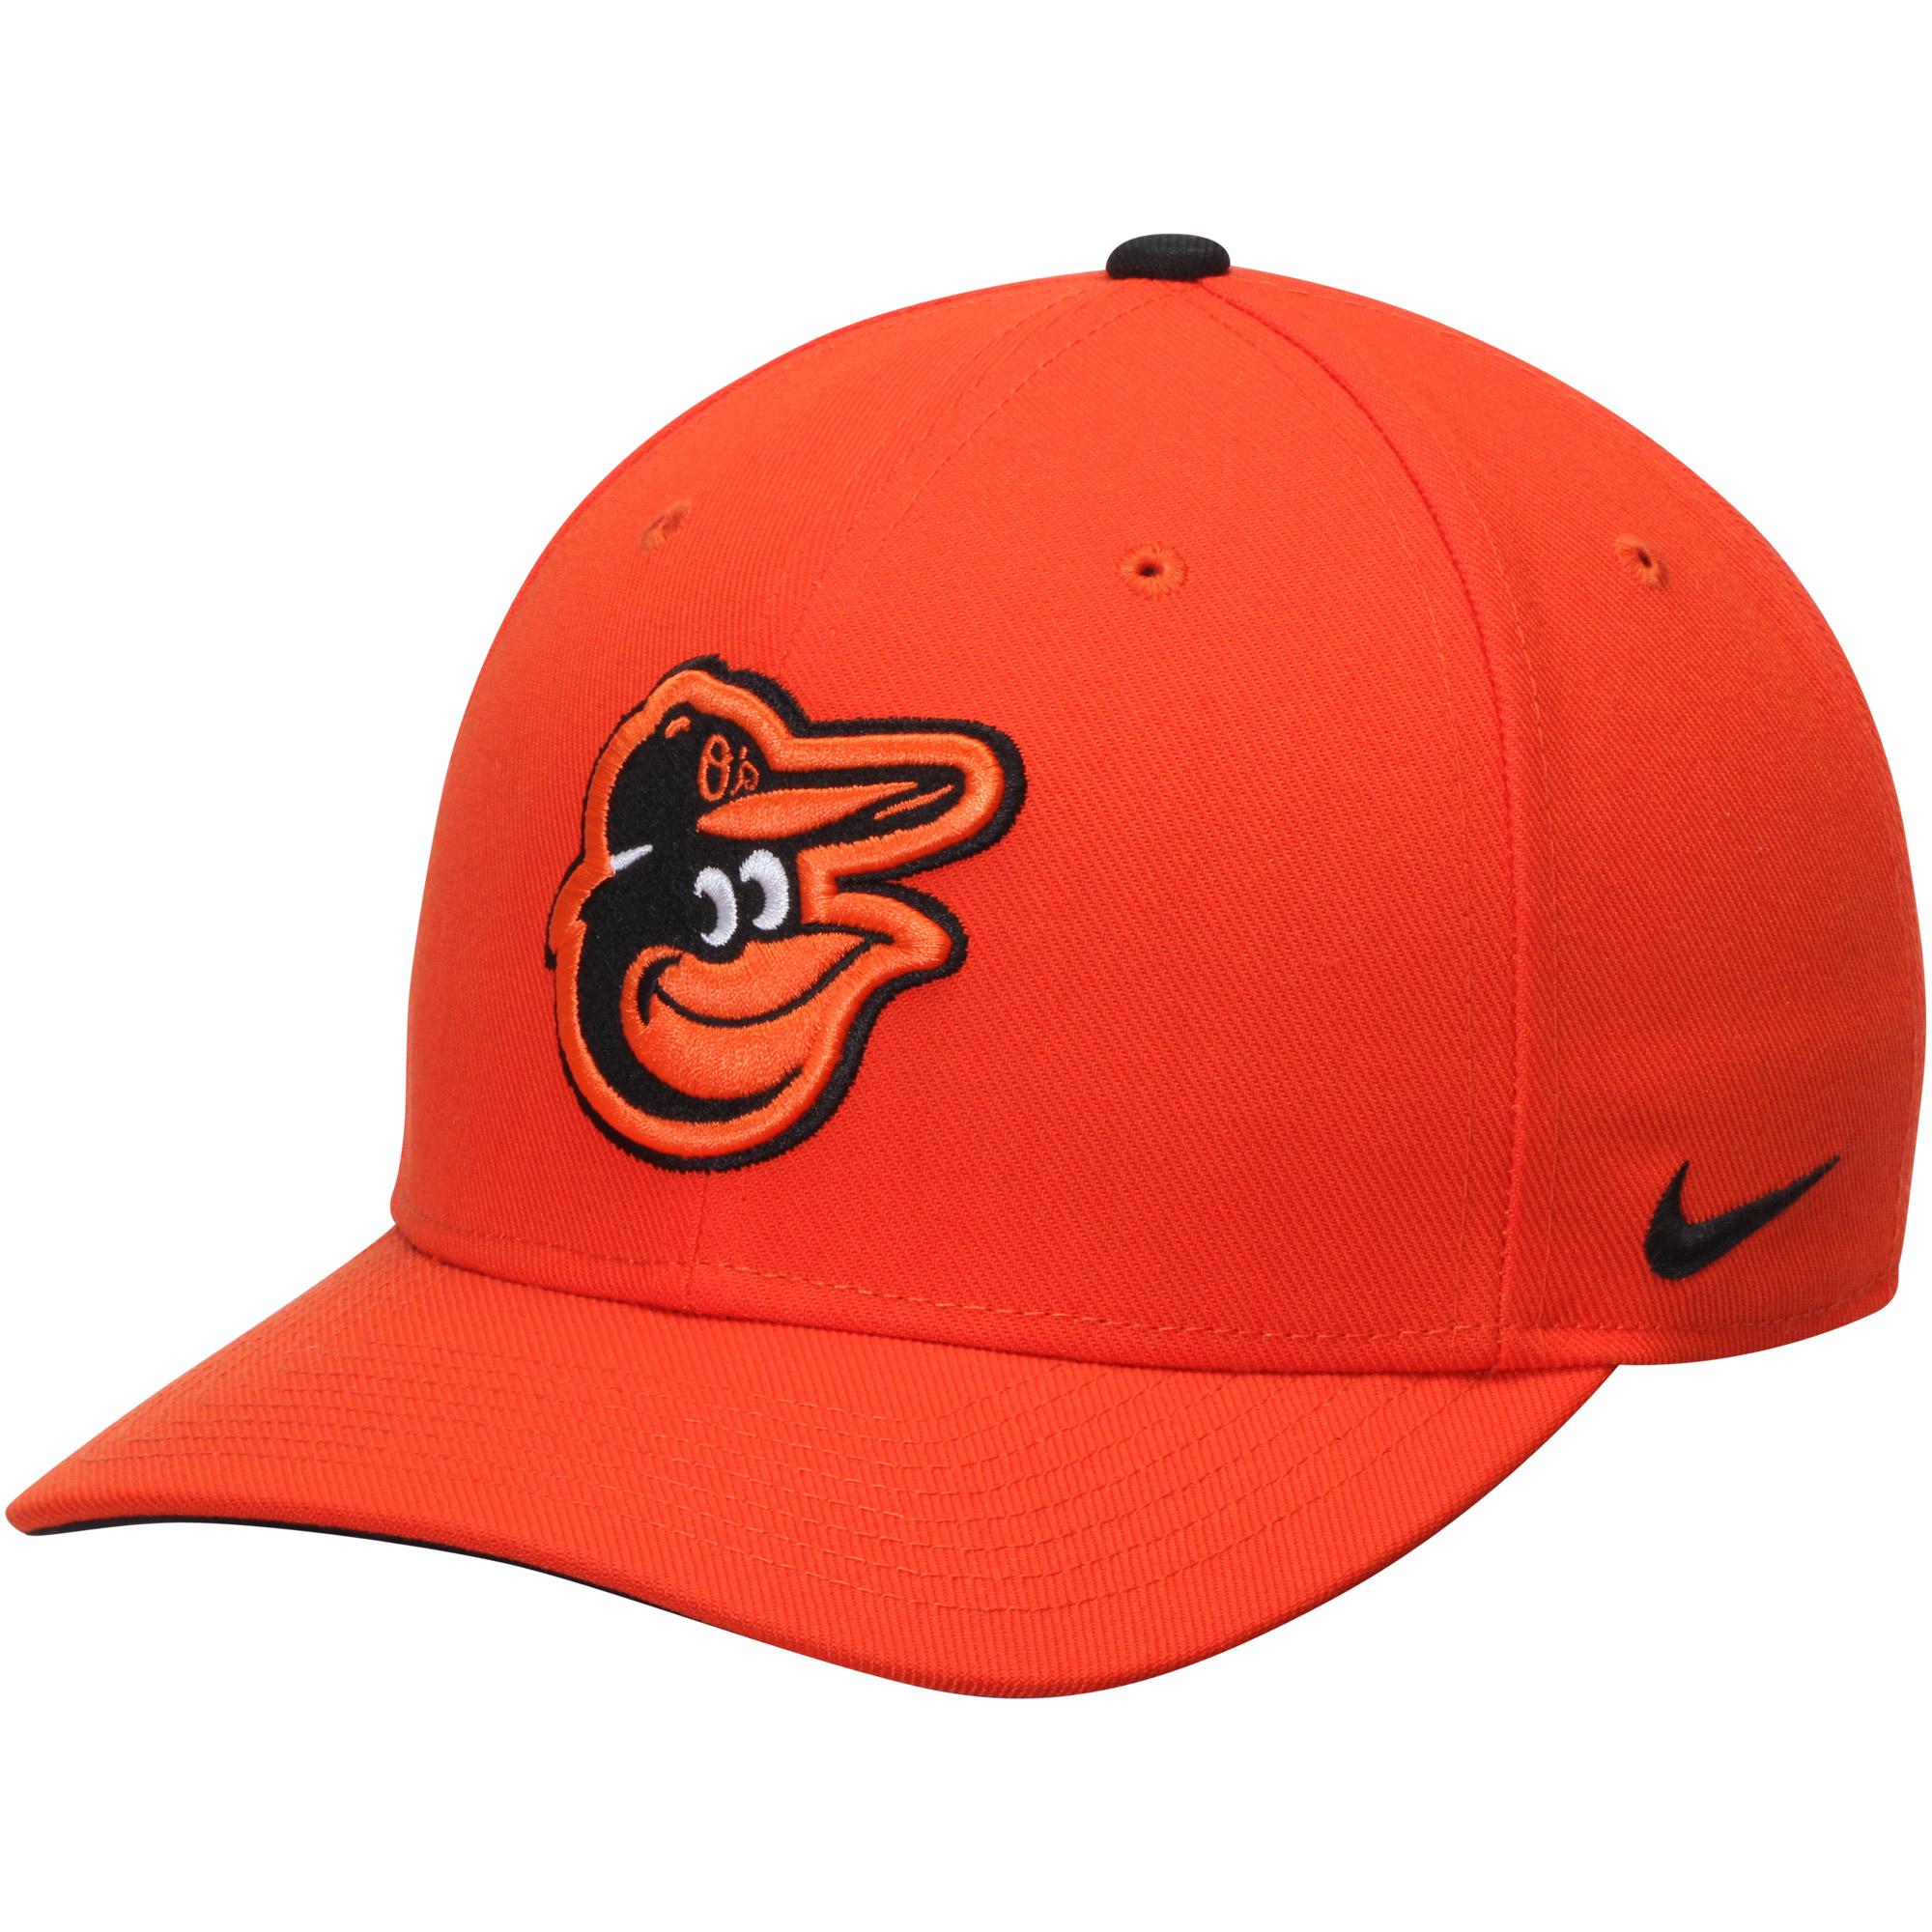 Baltimore Orioles Nike Classic Adjustable Performance Hat - Orange - OSFA